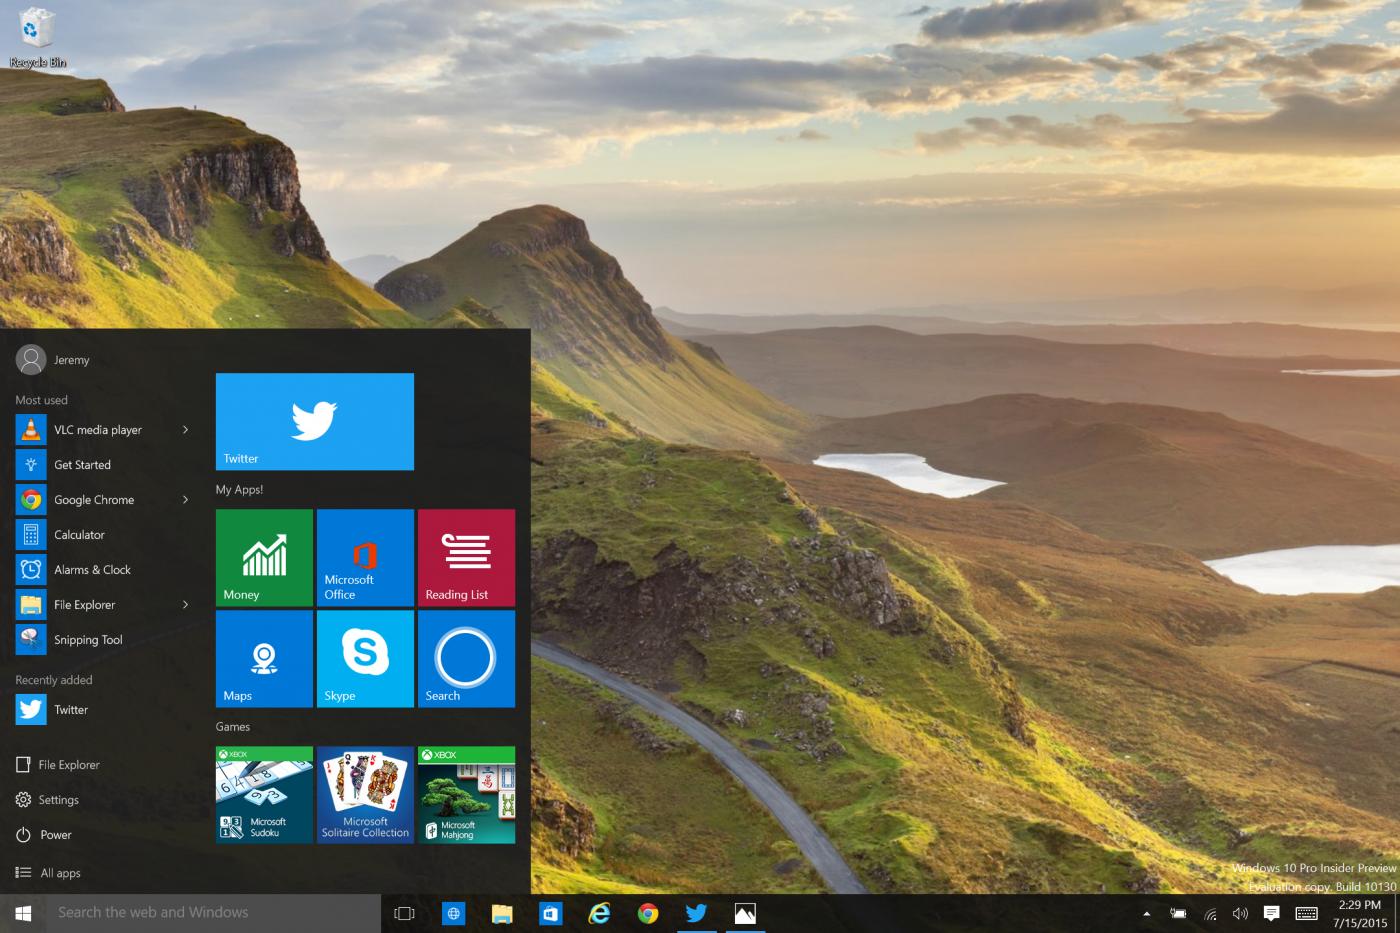 Windows 10 Gets Its Own Shiny New Twitter App | TechCrunch